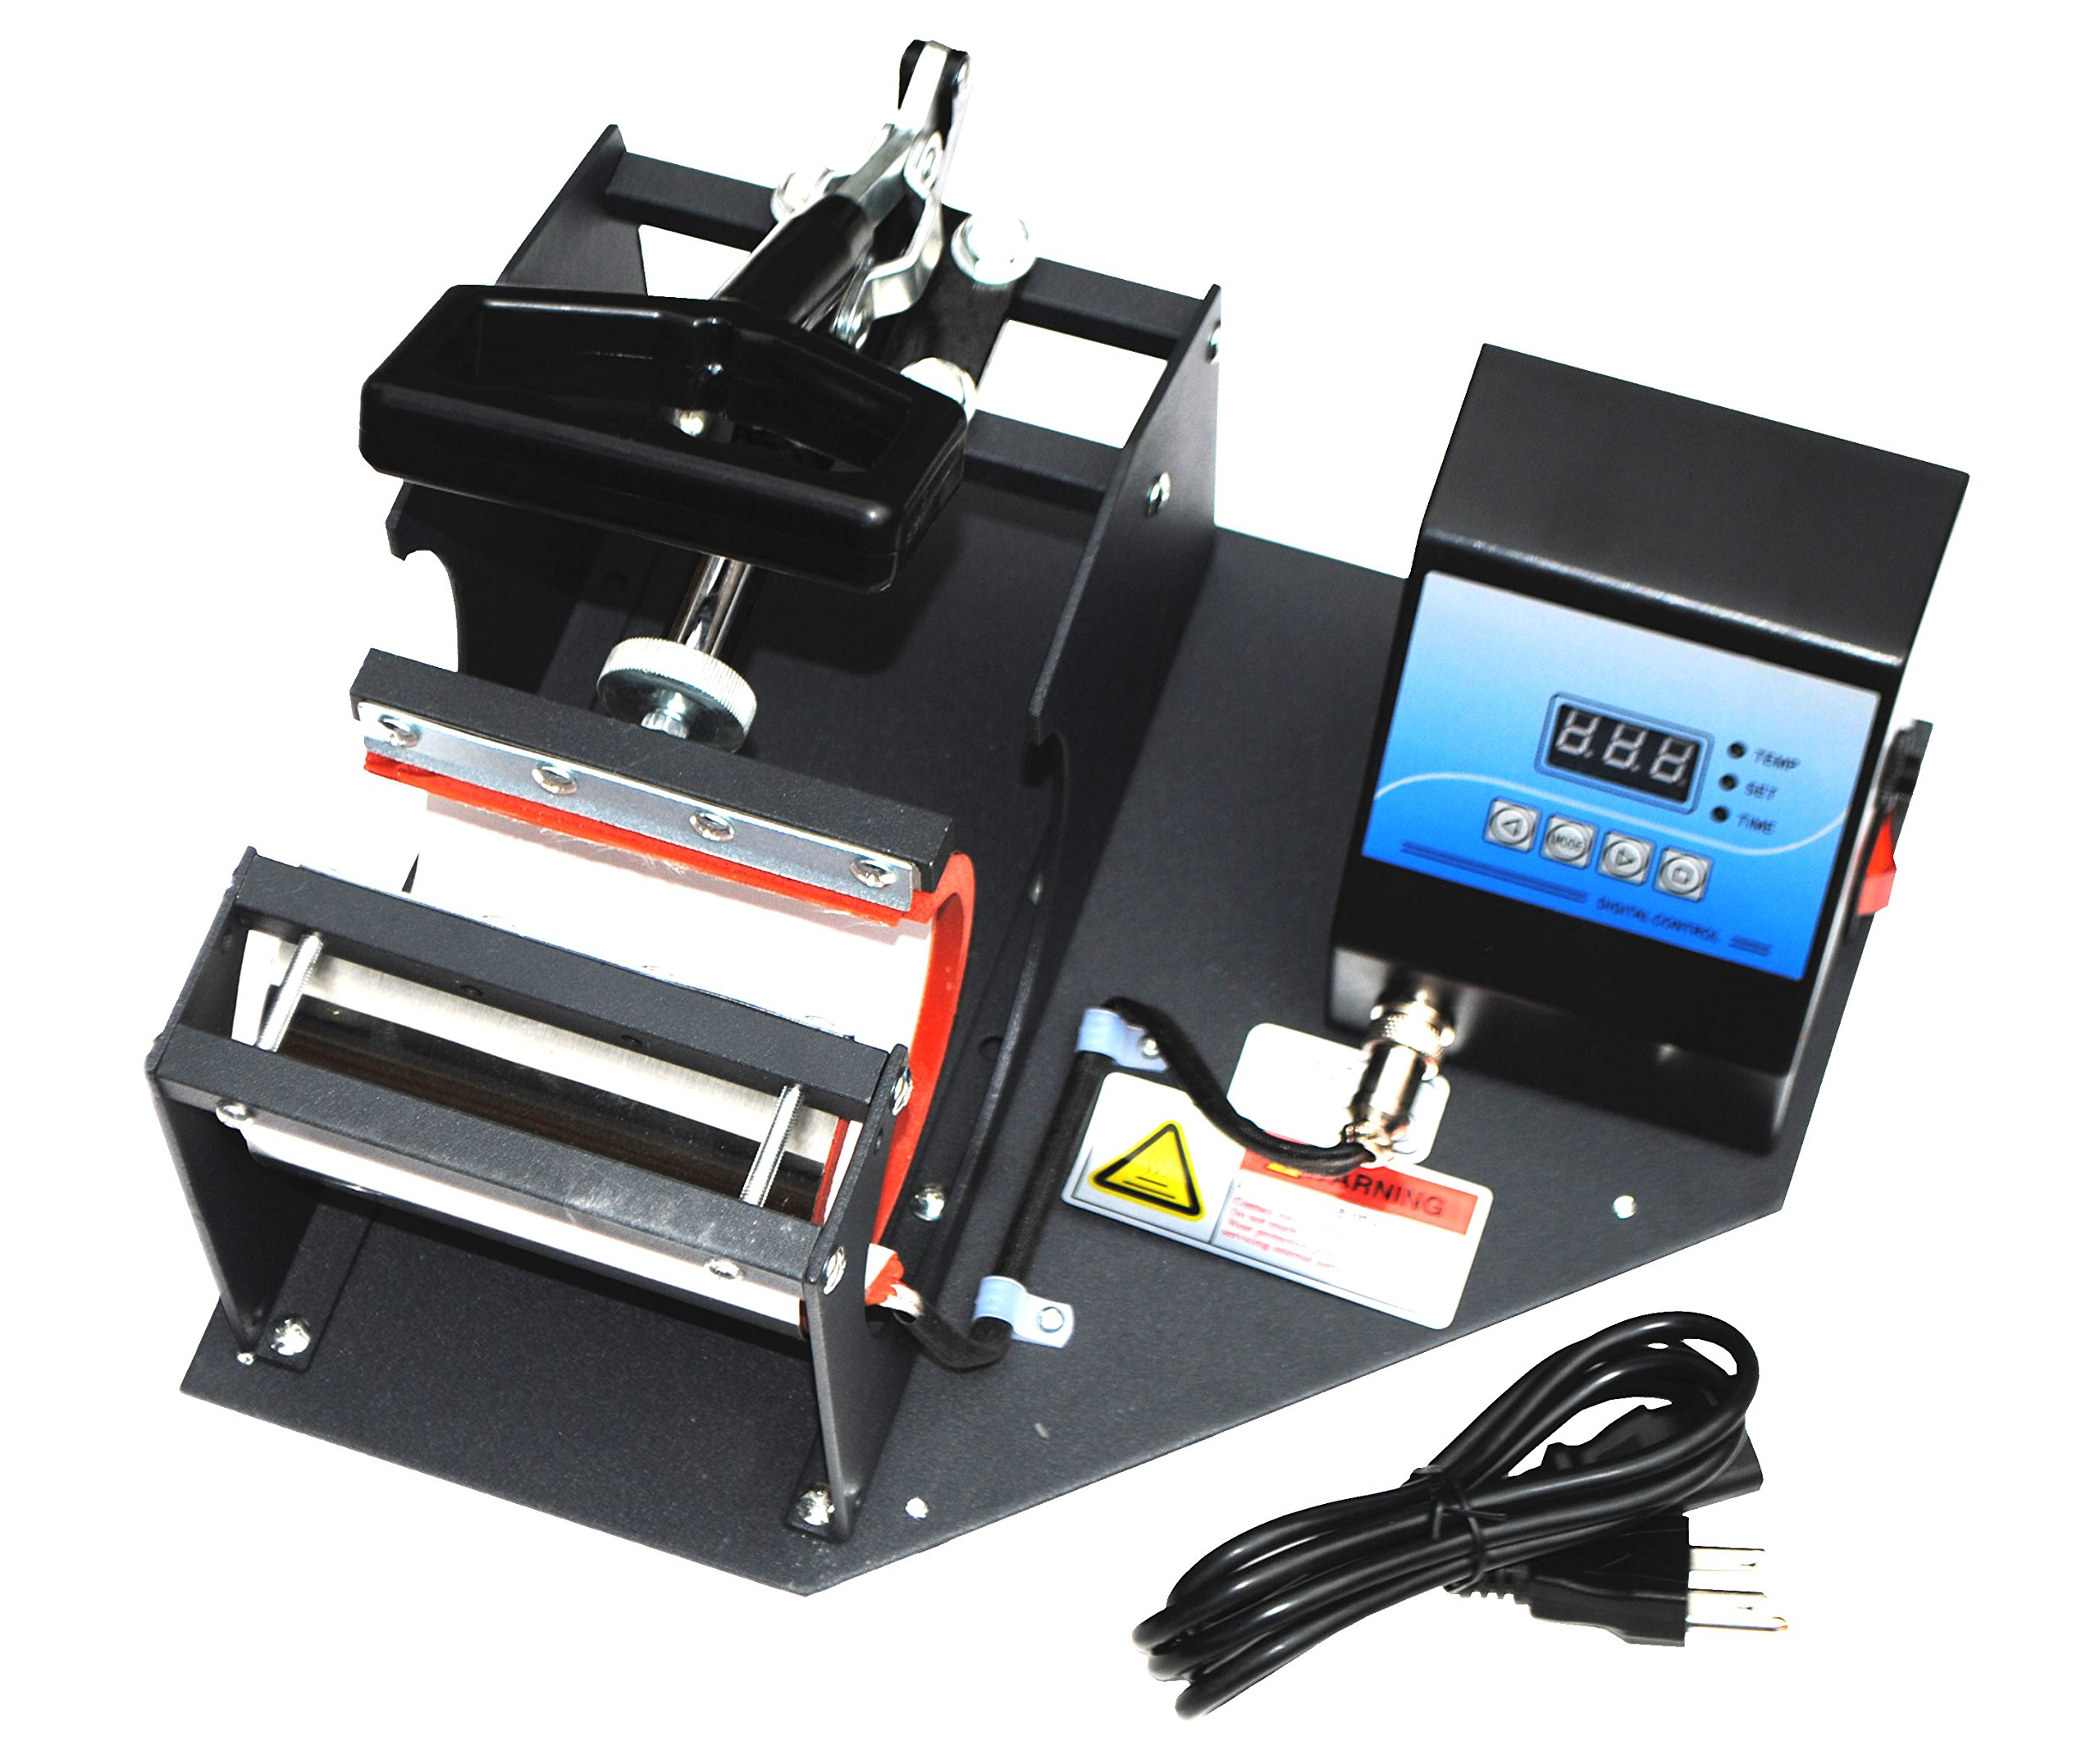 Sican Black Coffee Cup Mug Heat Sublimation Press Transfer Printing Machine by Sican